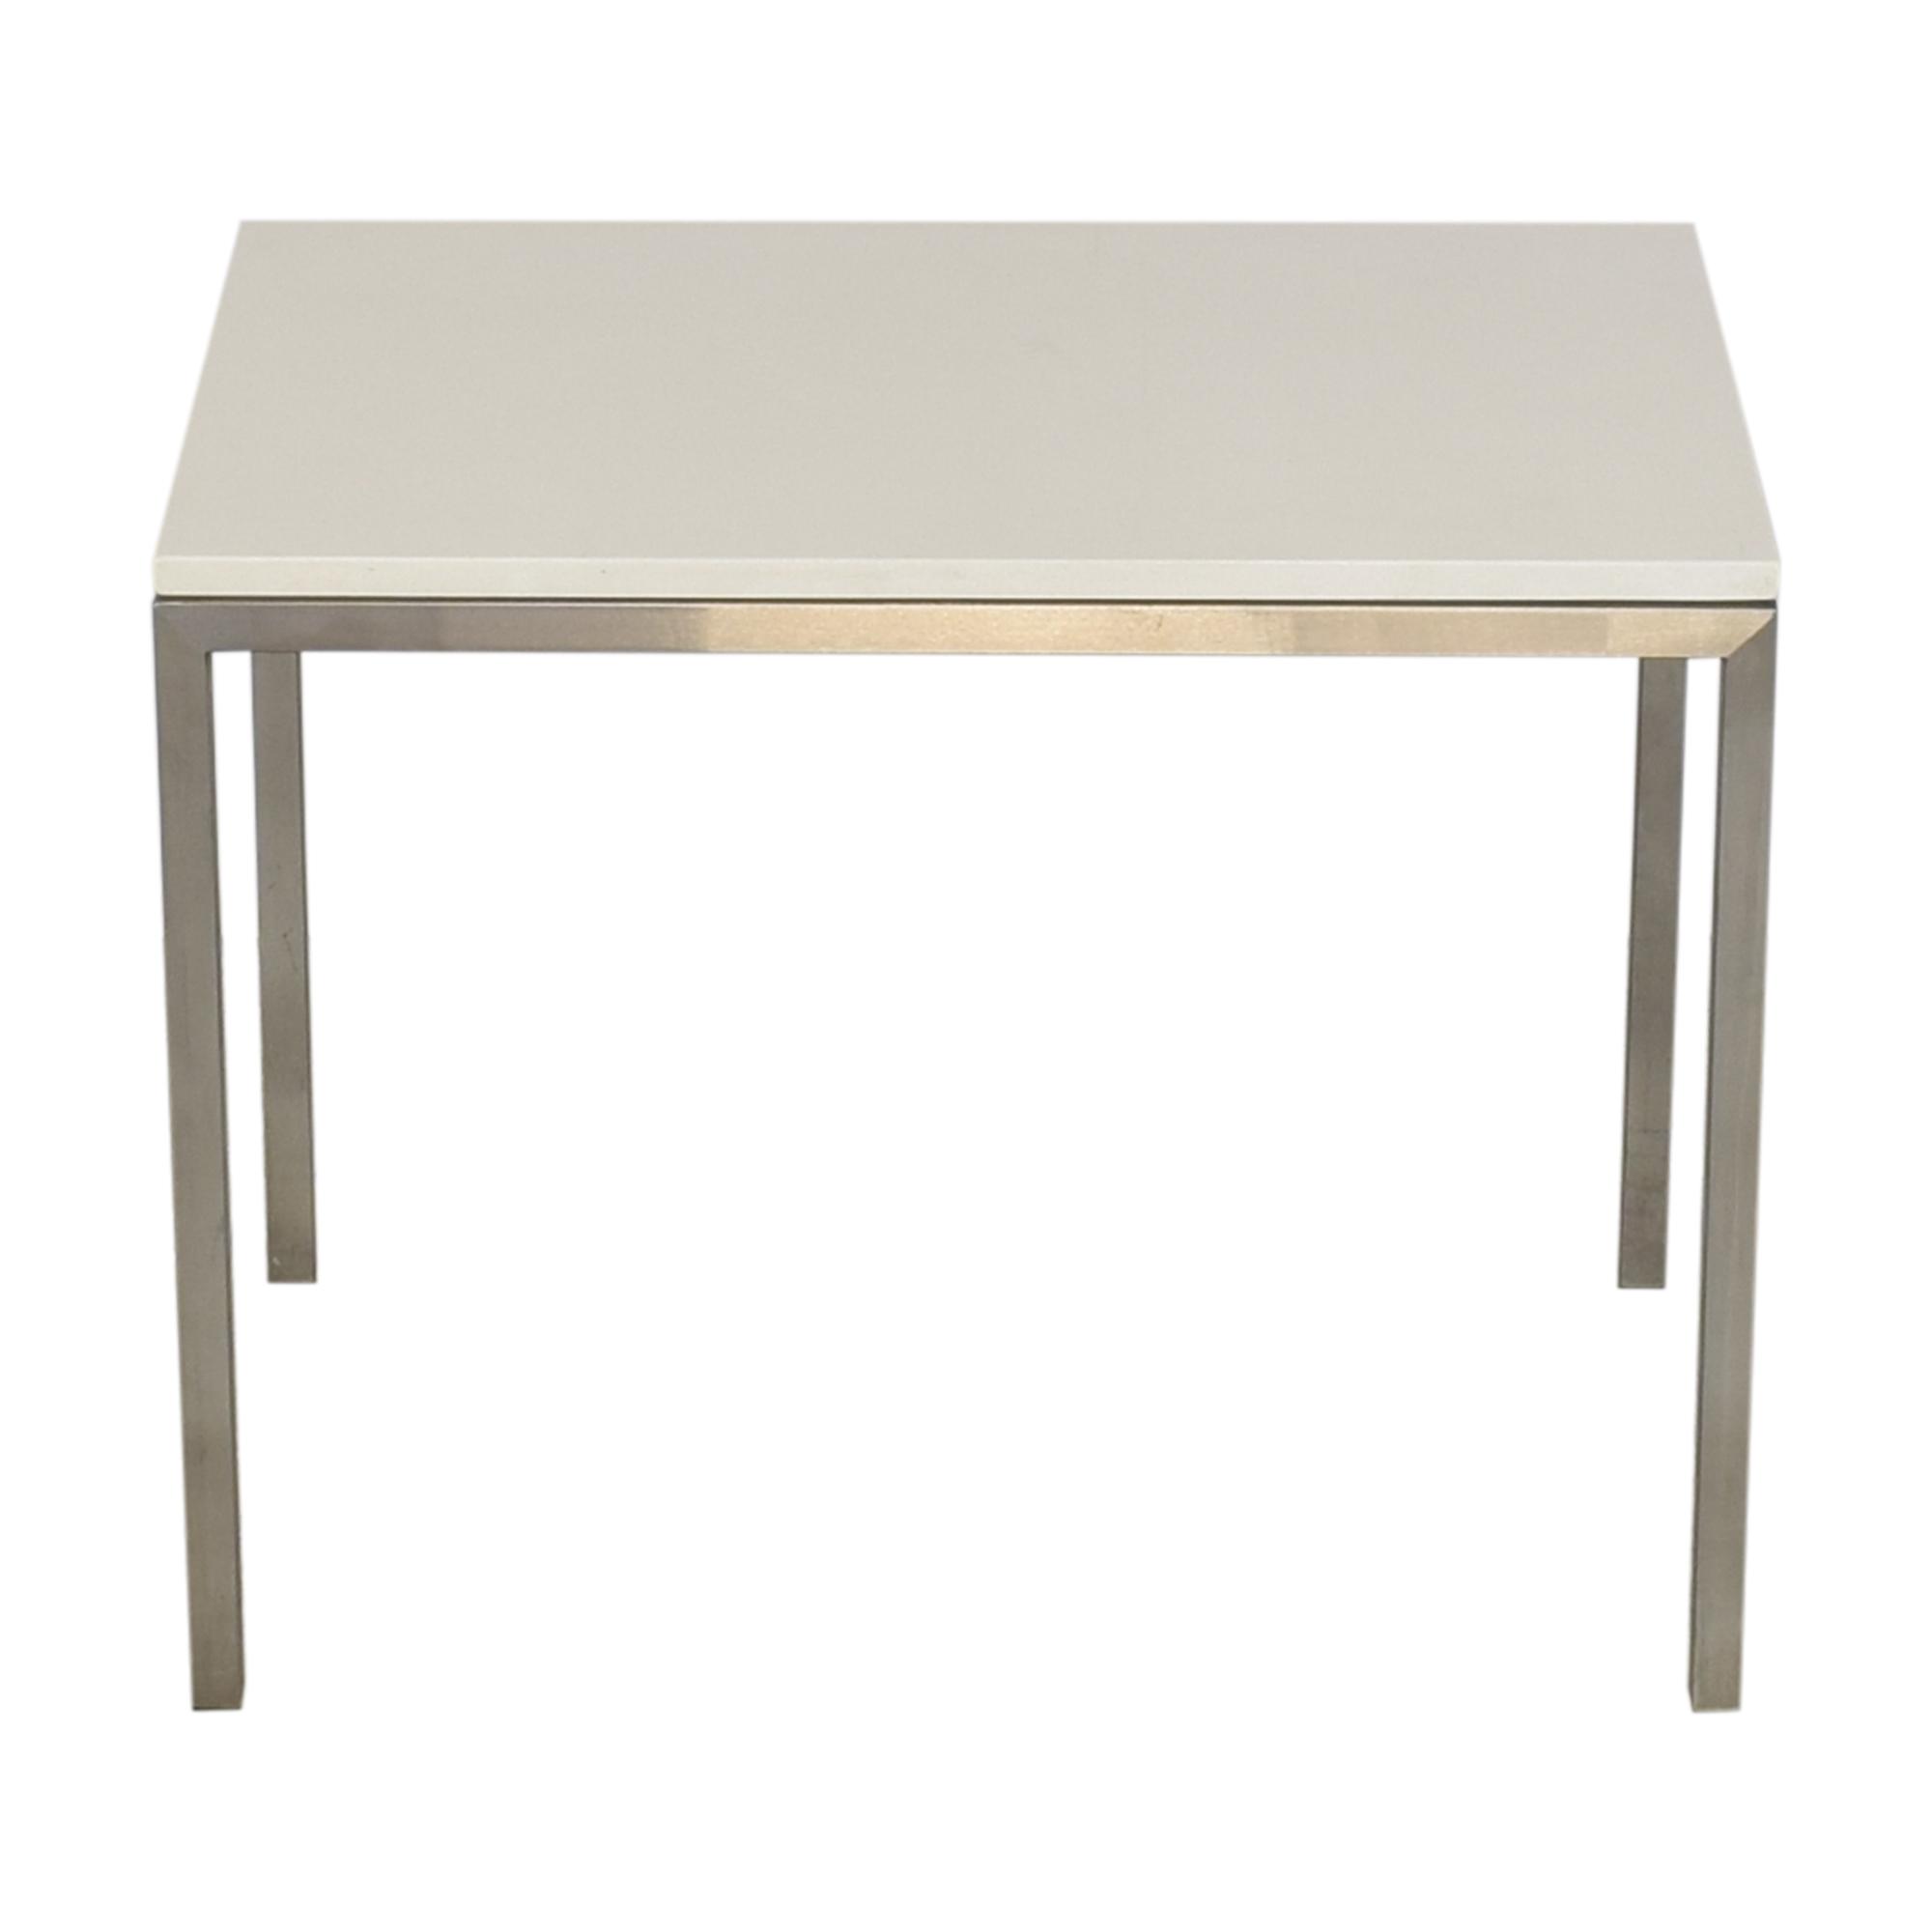 Room & Board Portica Table / Tables